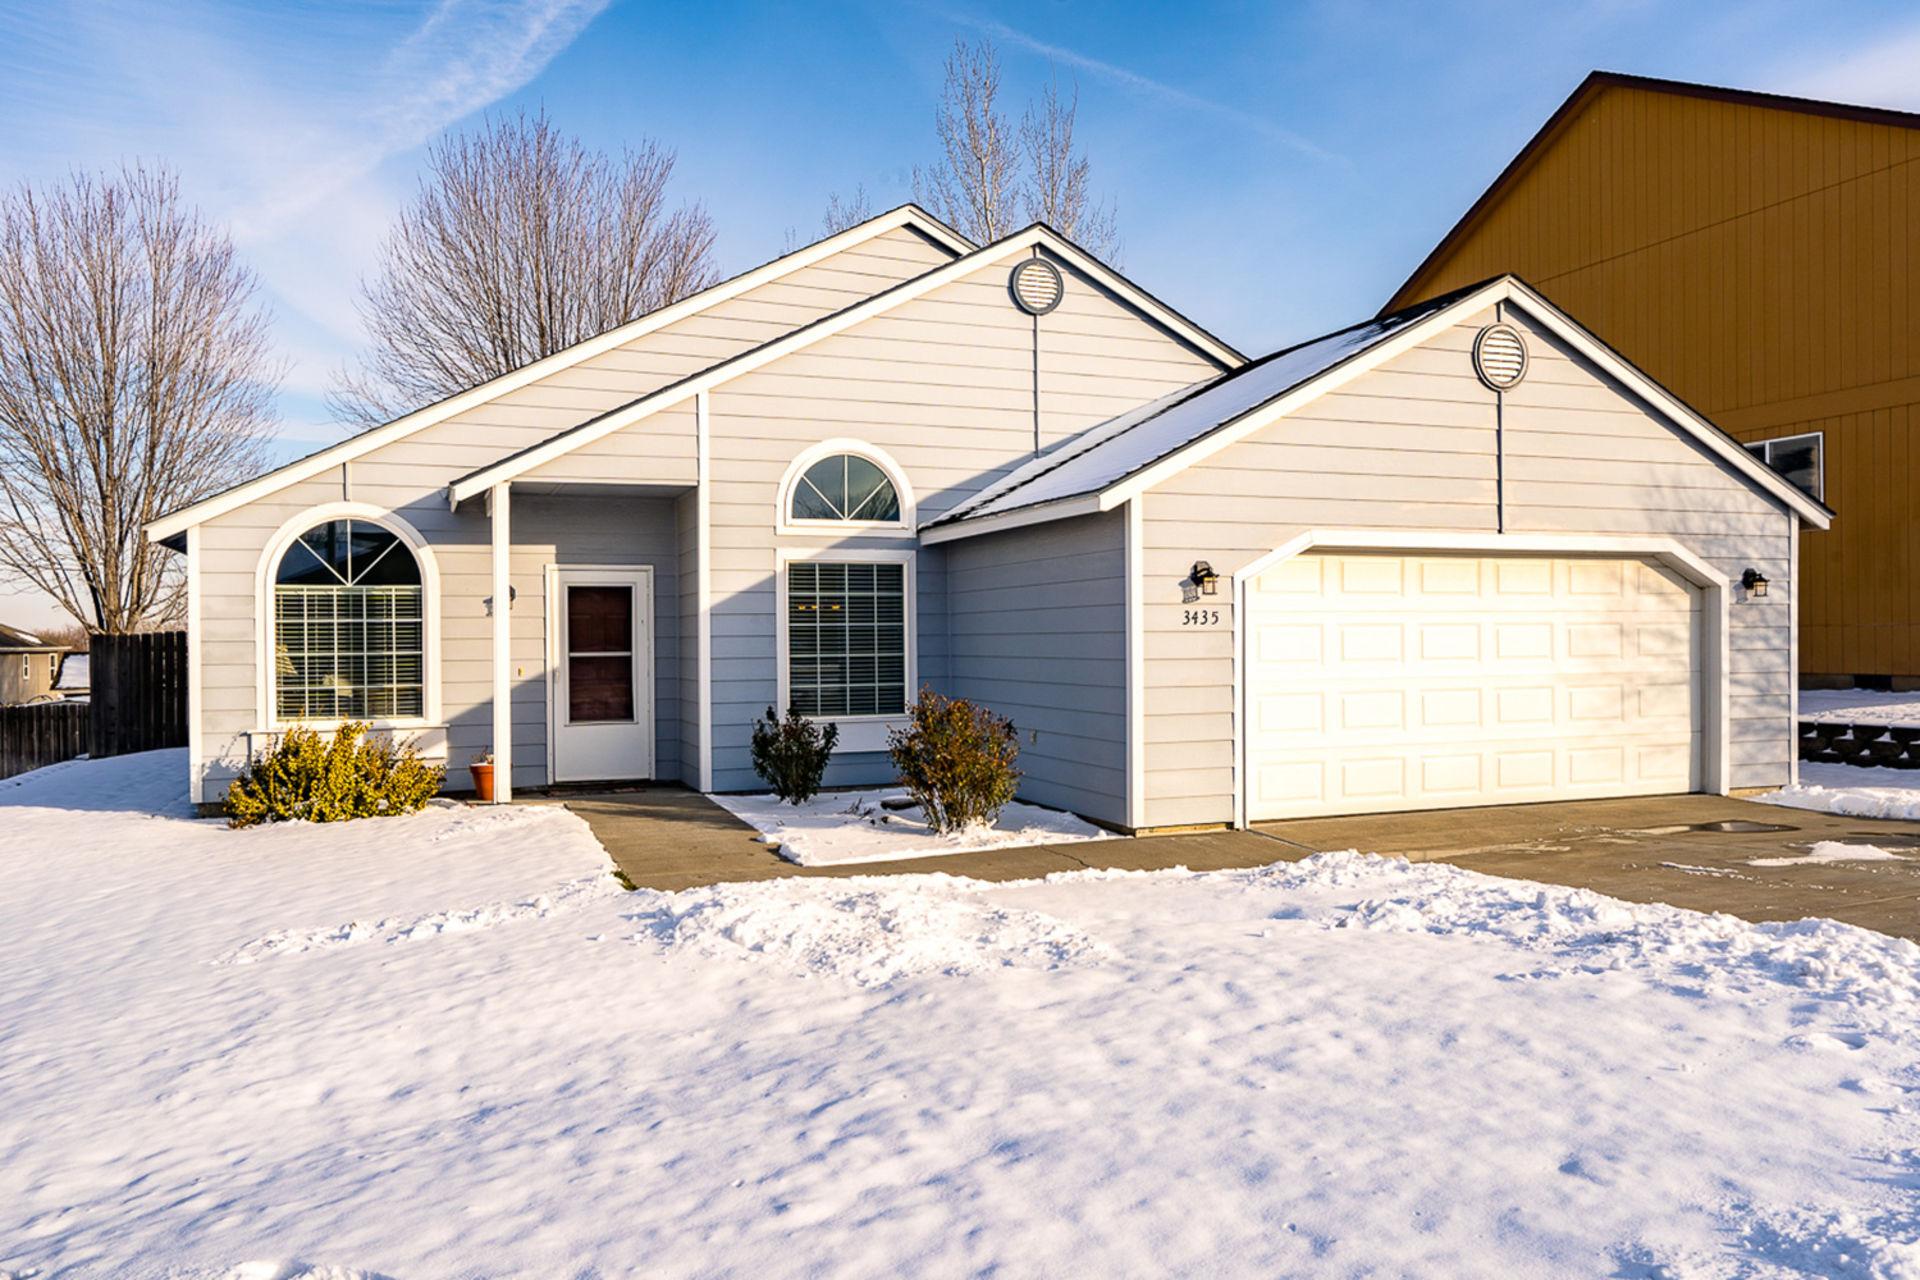 New listing: 3435 S. Dennis St., Kennewick